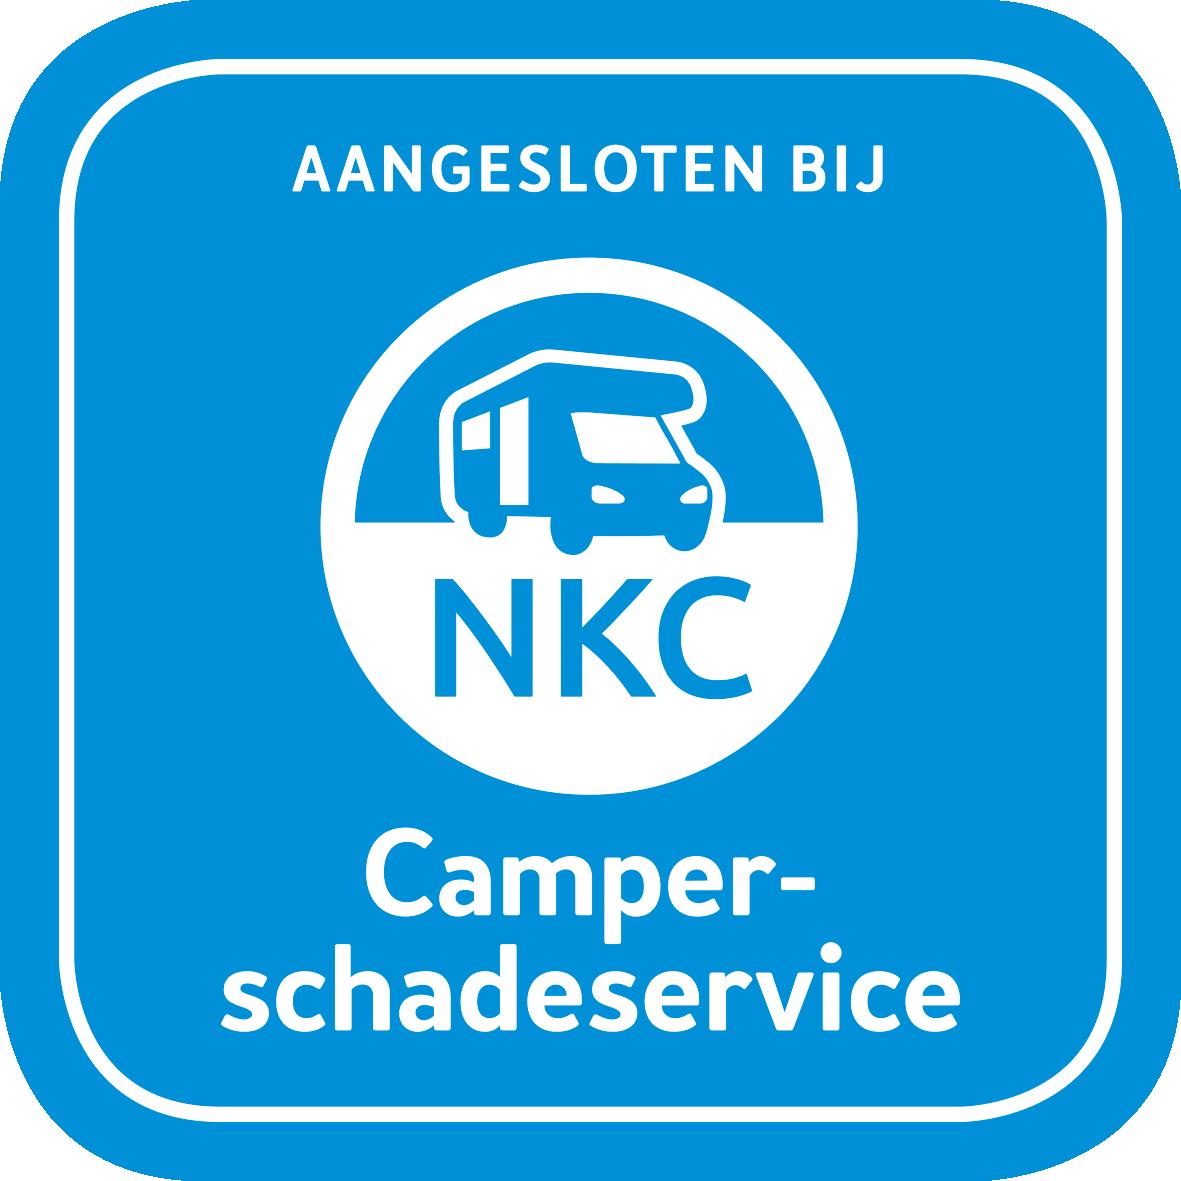 NKC Camper-schadeservice